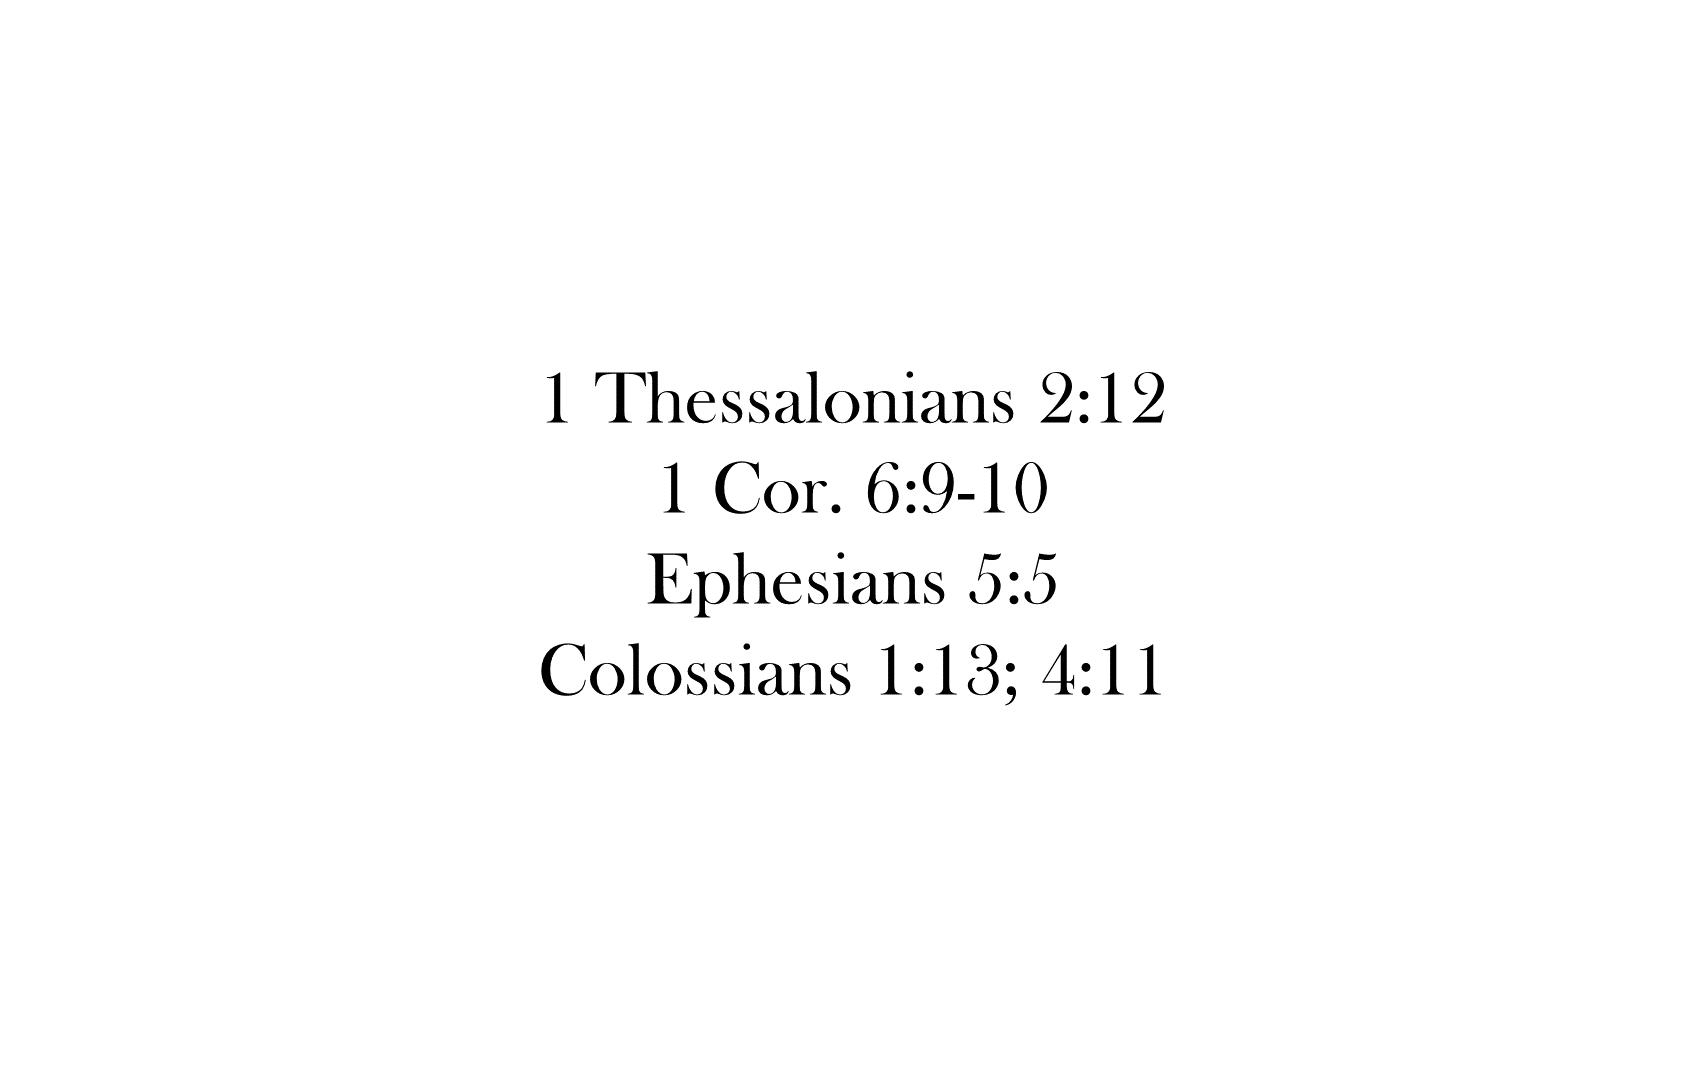 ESH-20 - The Discipline Of Disciple-Making - Seeing, Understanding, Entering, Living, & Seeking The Kingdom Of God ( (20)